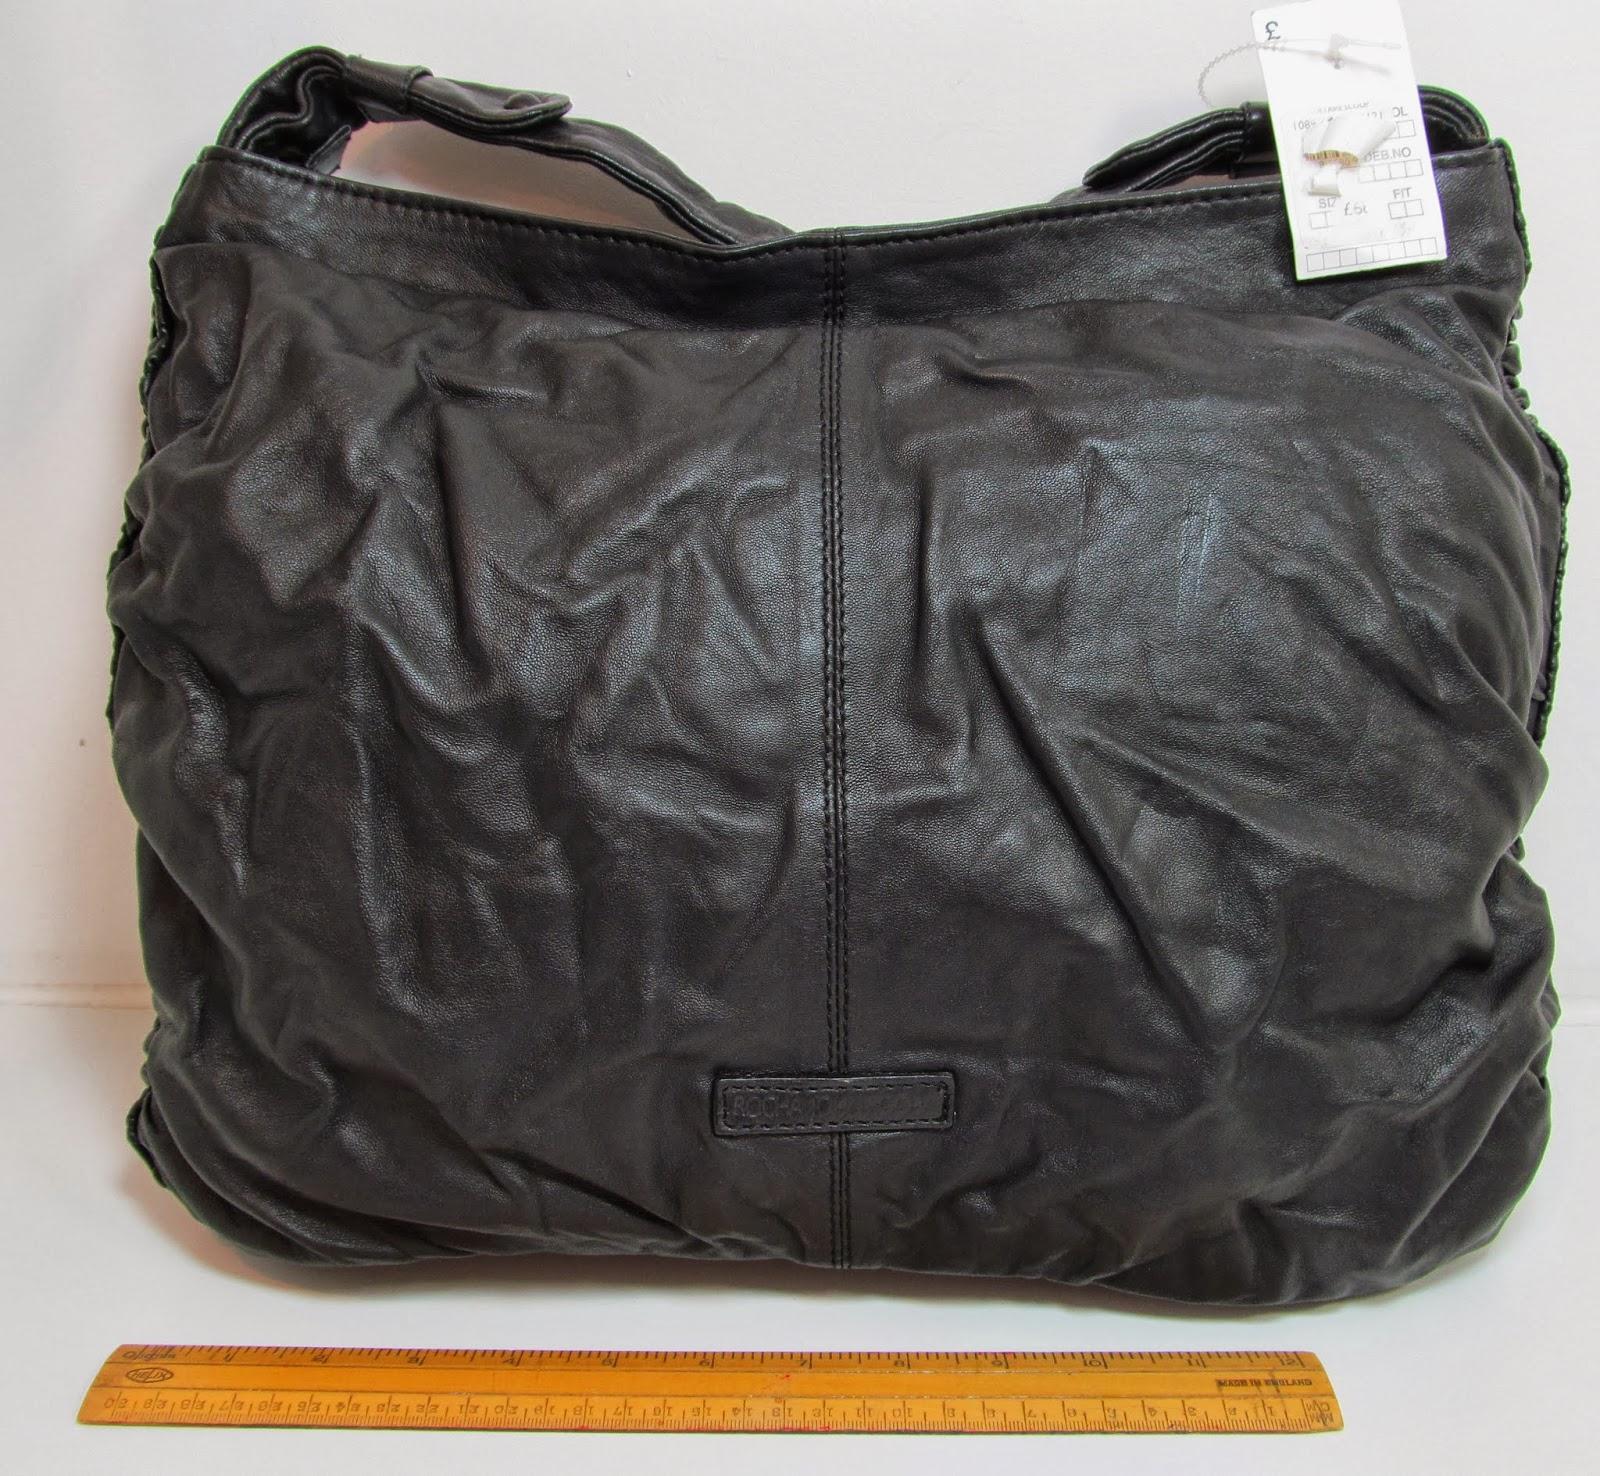 Rocha John Black Quality Leather Slouch Shoulder Bag Handbag Purse T75